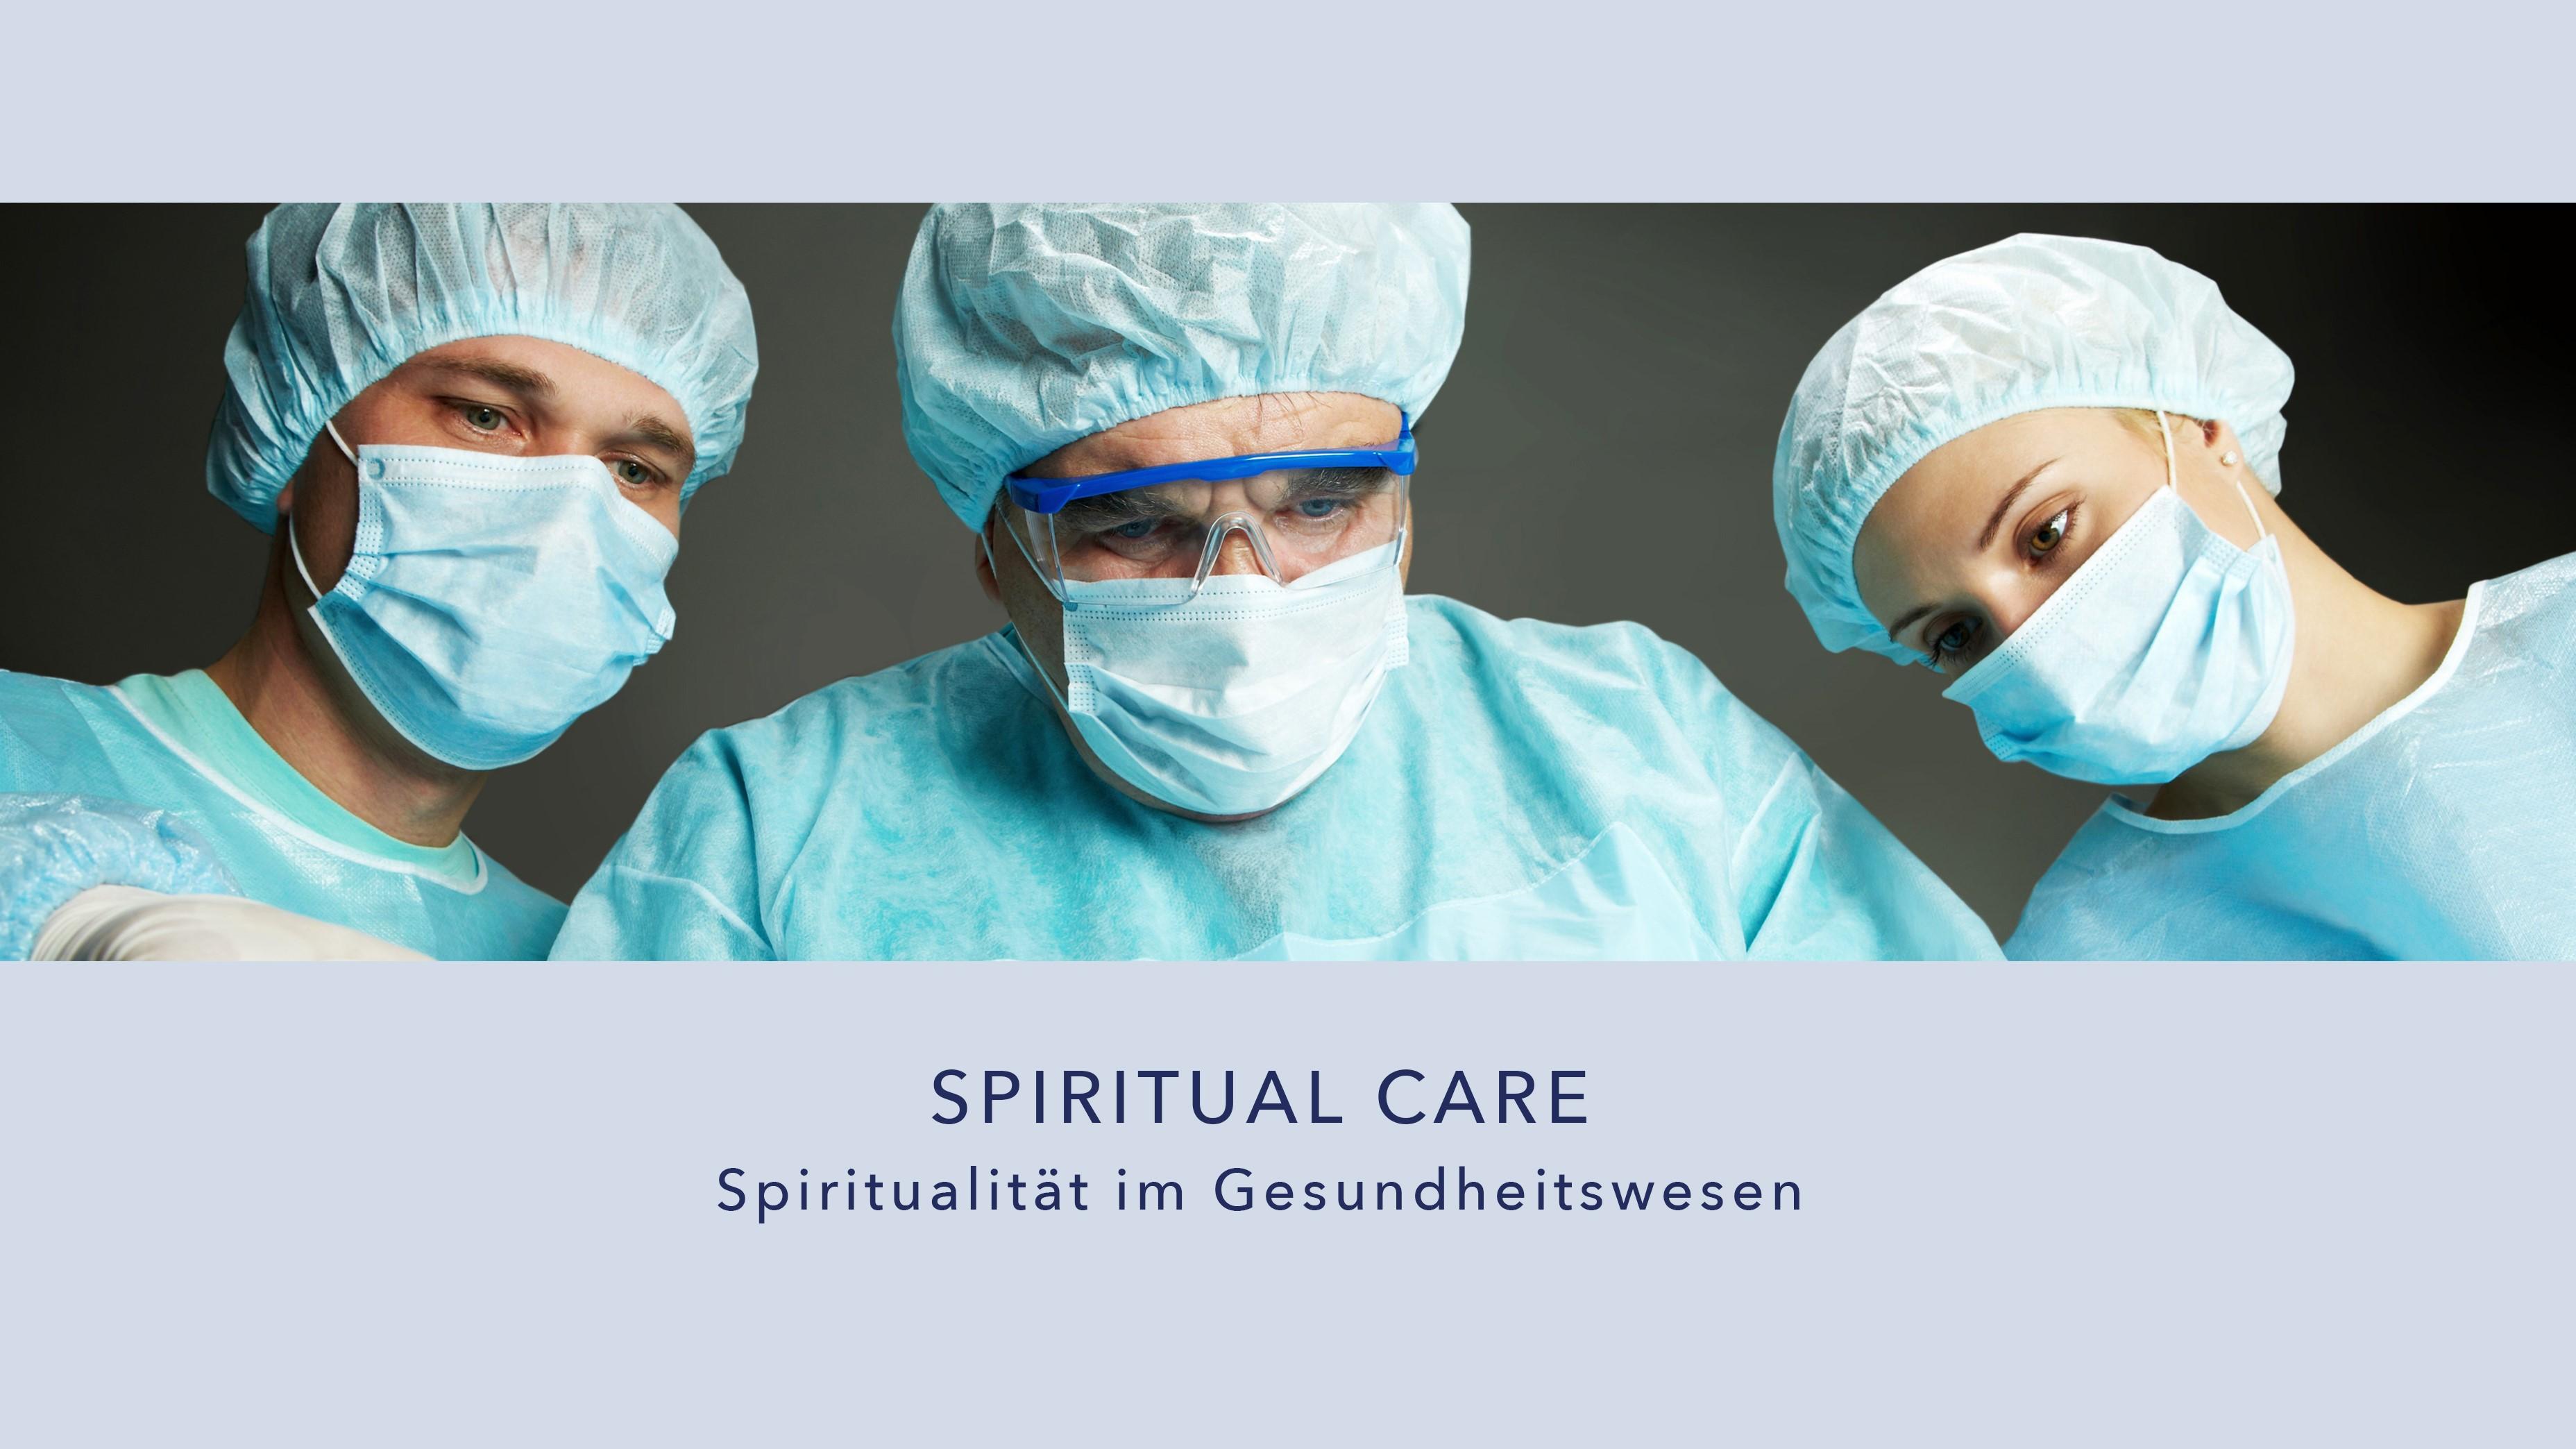 thumbnail SpiritualCare_ultrahbl.jpg